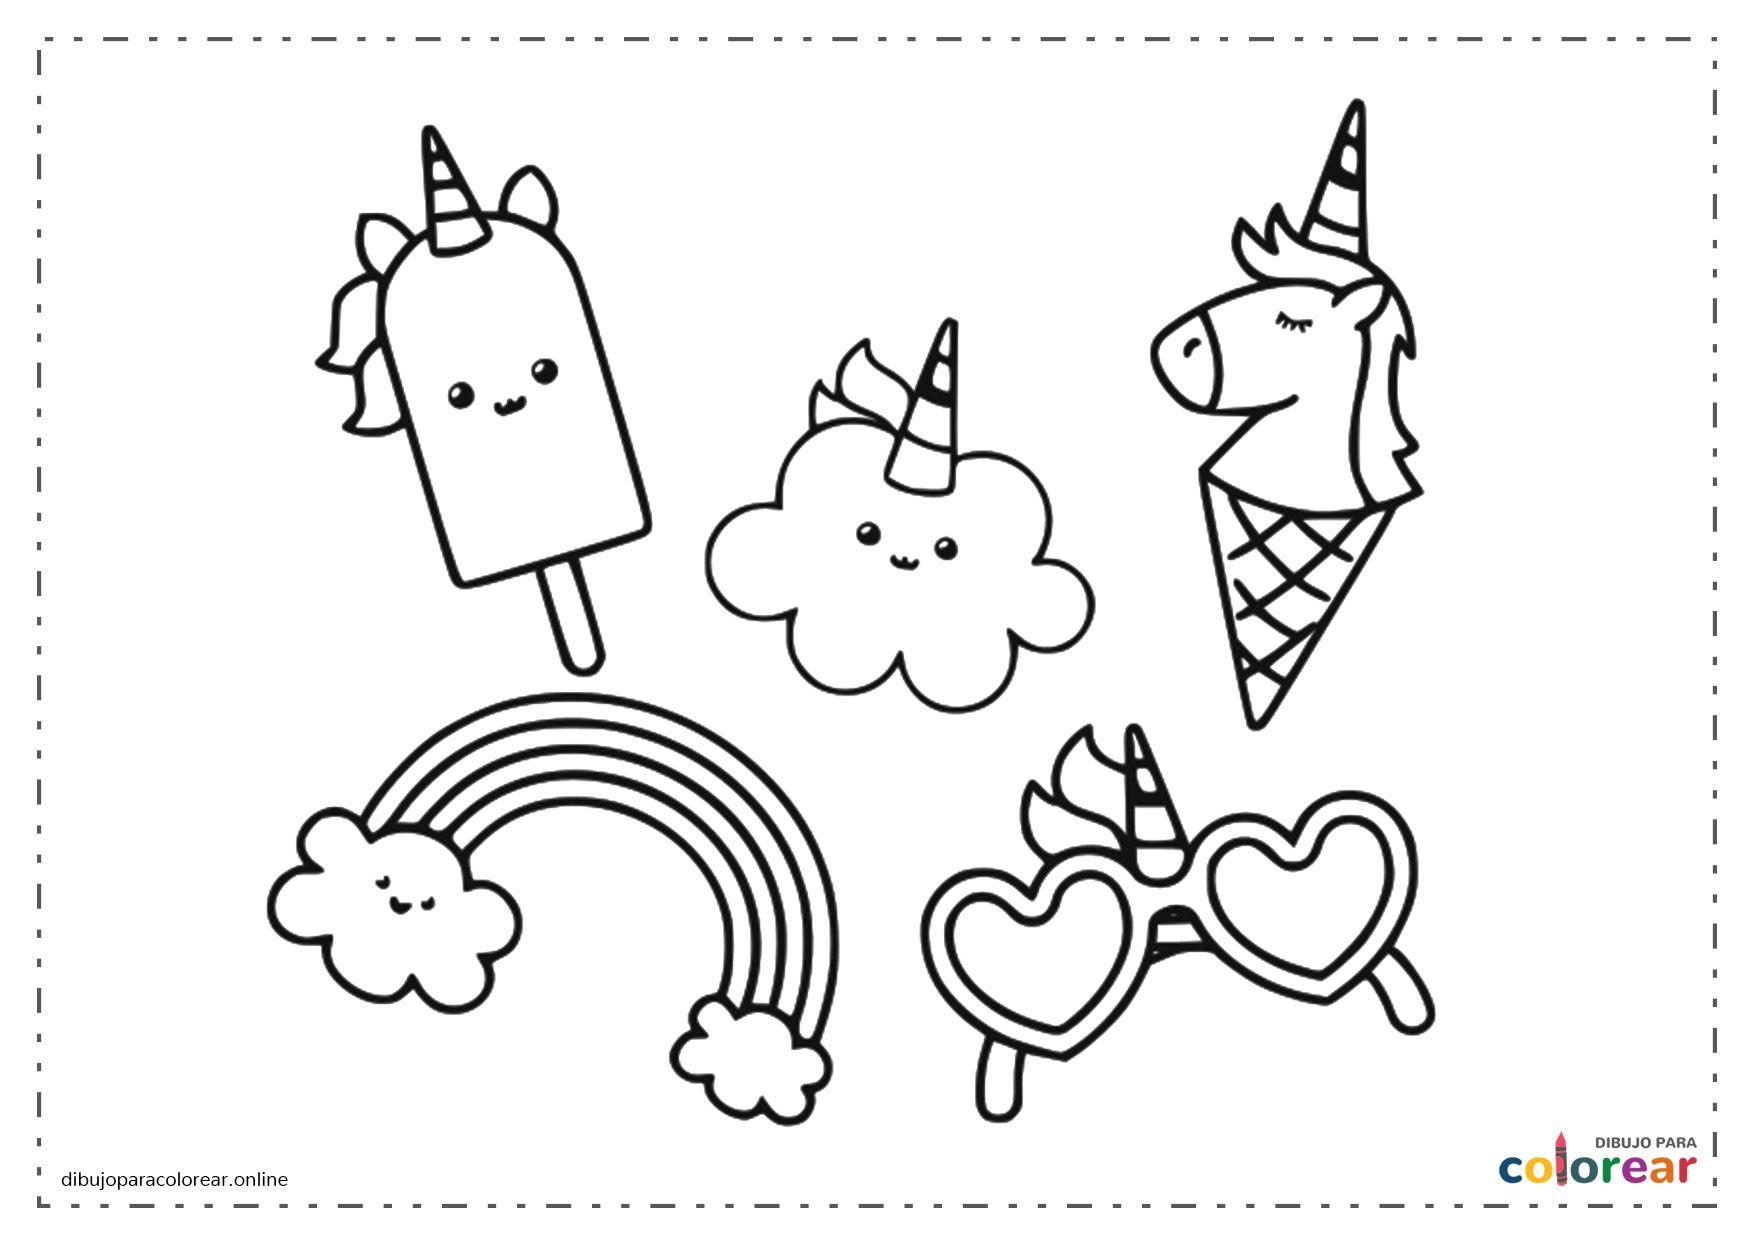 Imagenes De Unicornios Para Colorear Busqueda De Google Desenhos Unicornio Desenho Colorir